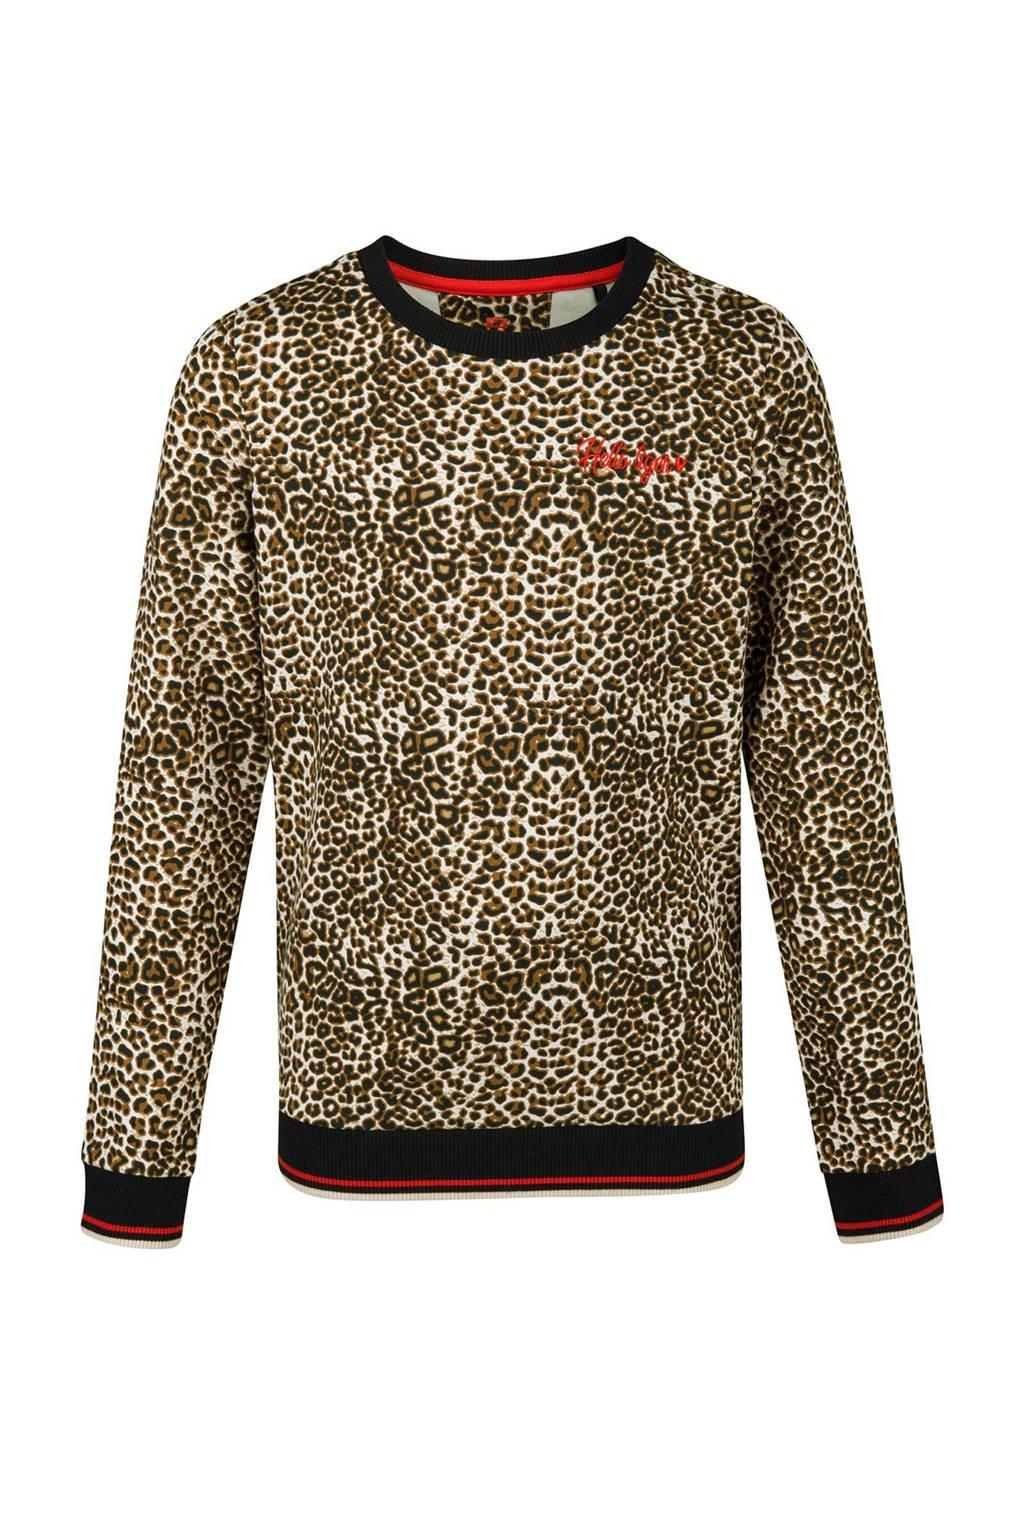 WE Fashion sweater met panterprint, Beige